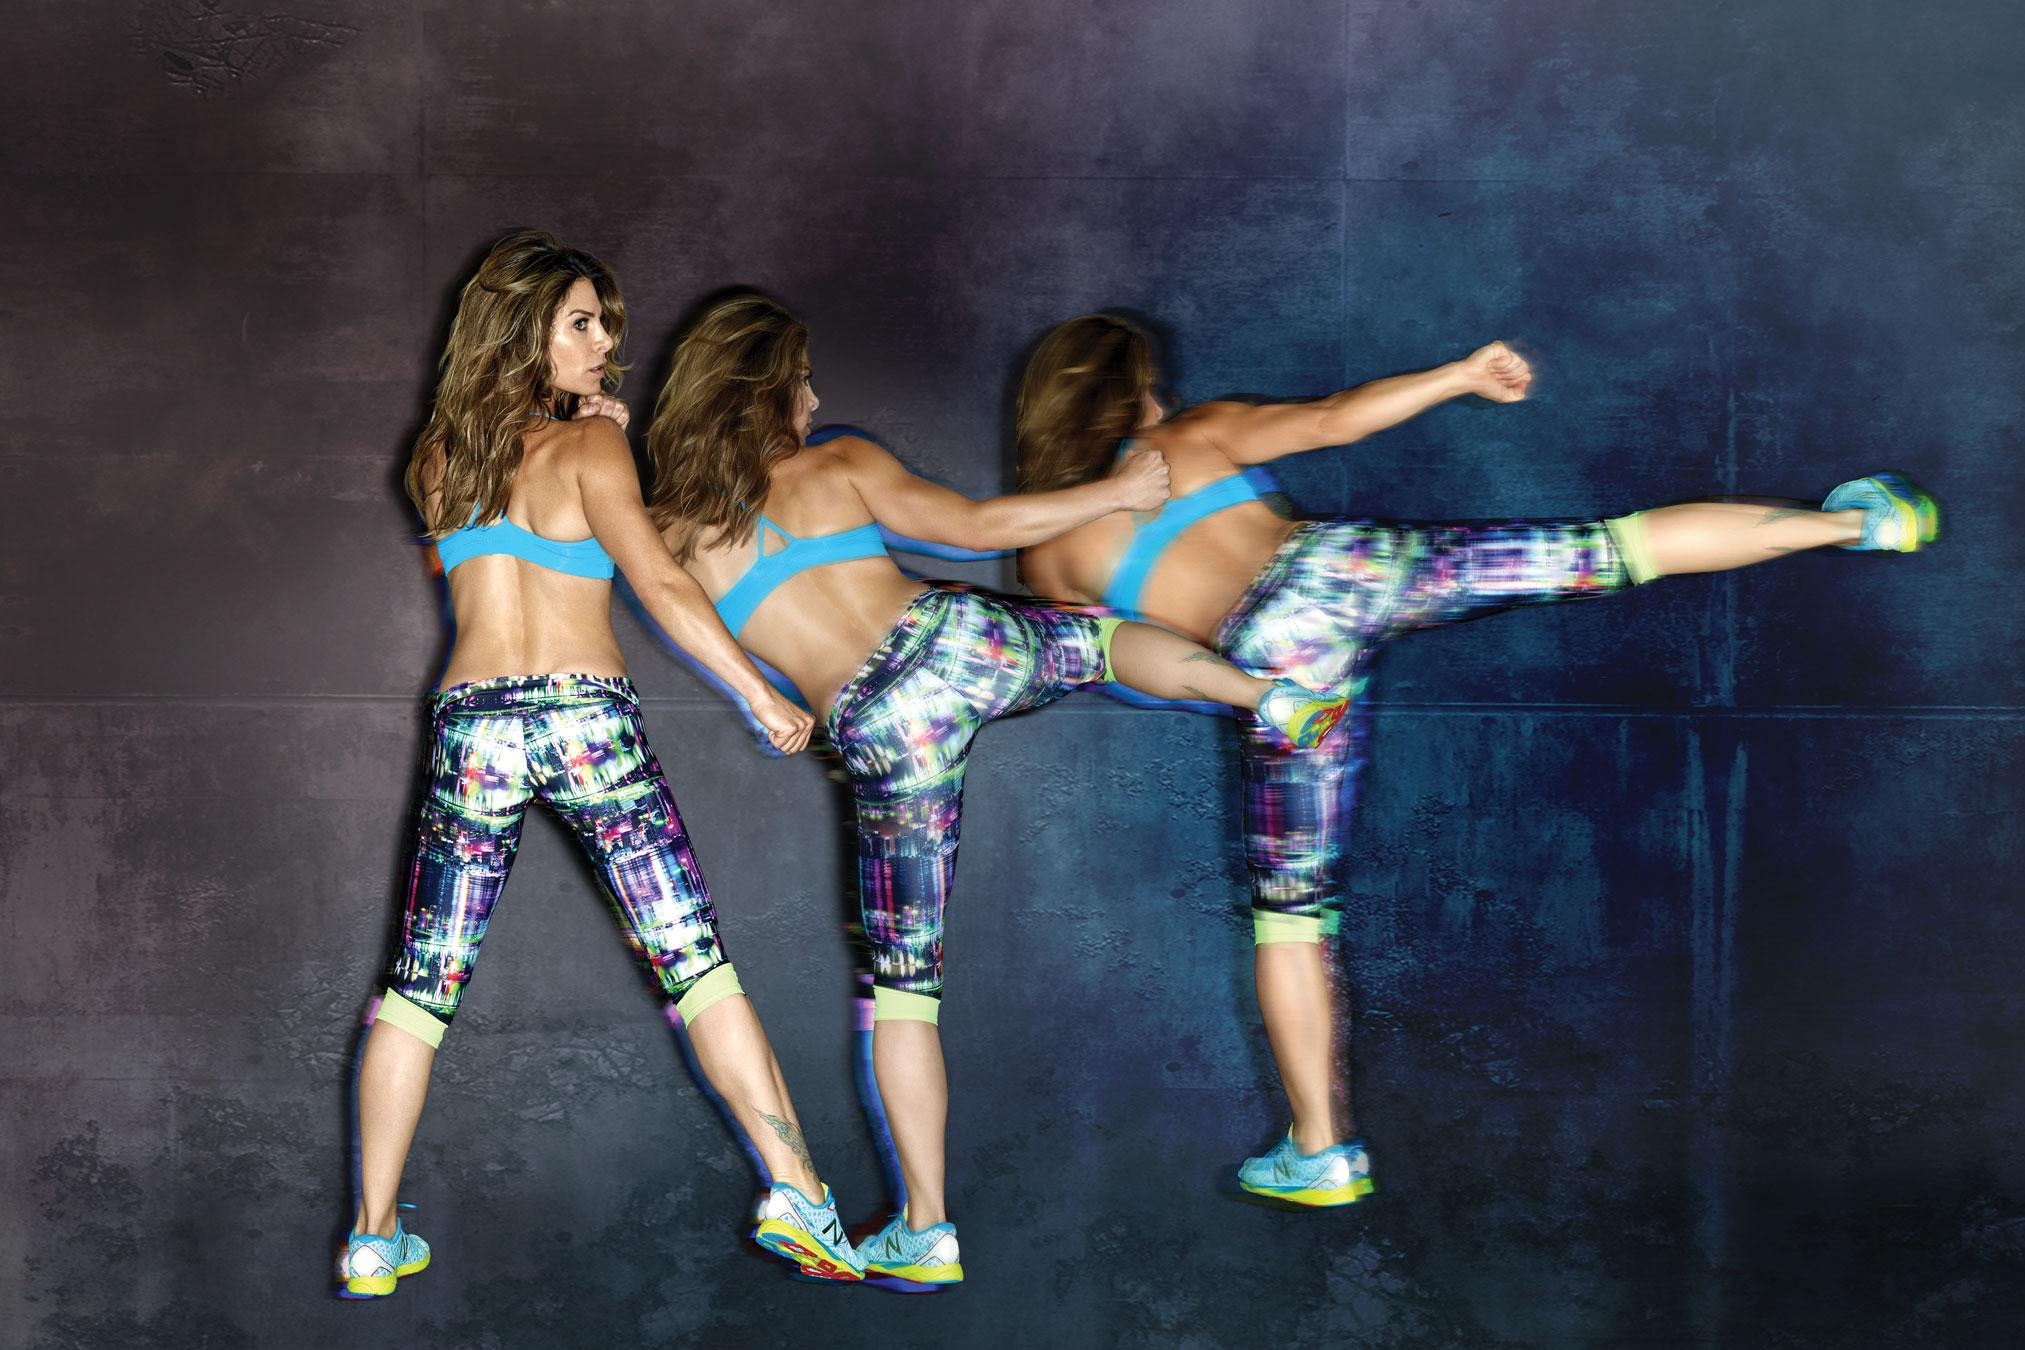 Amazon.com : Jillian Michaels Body Shred : Sports & Outdoors